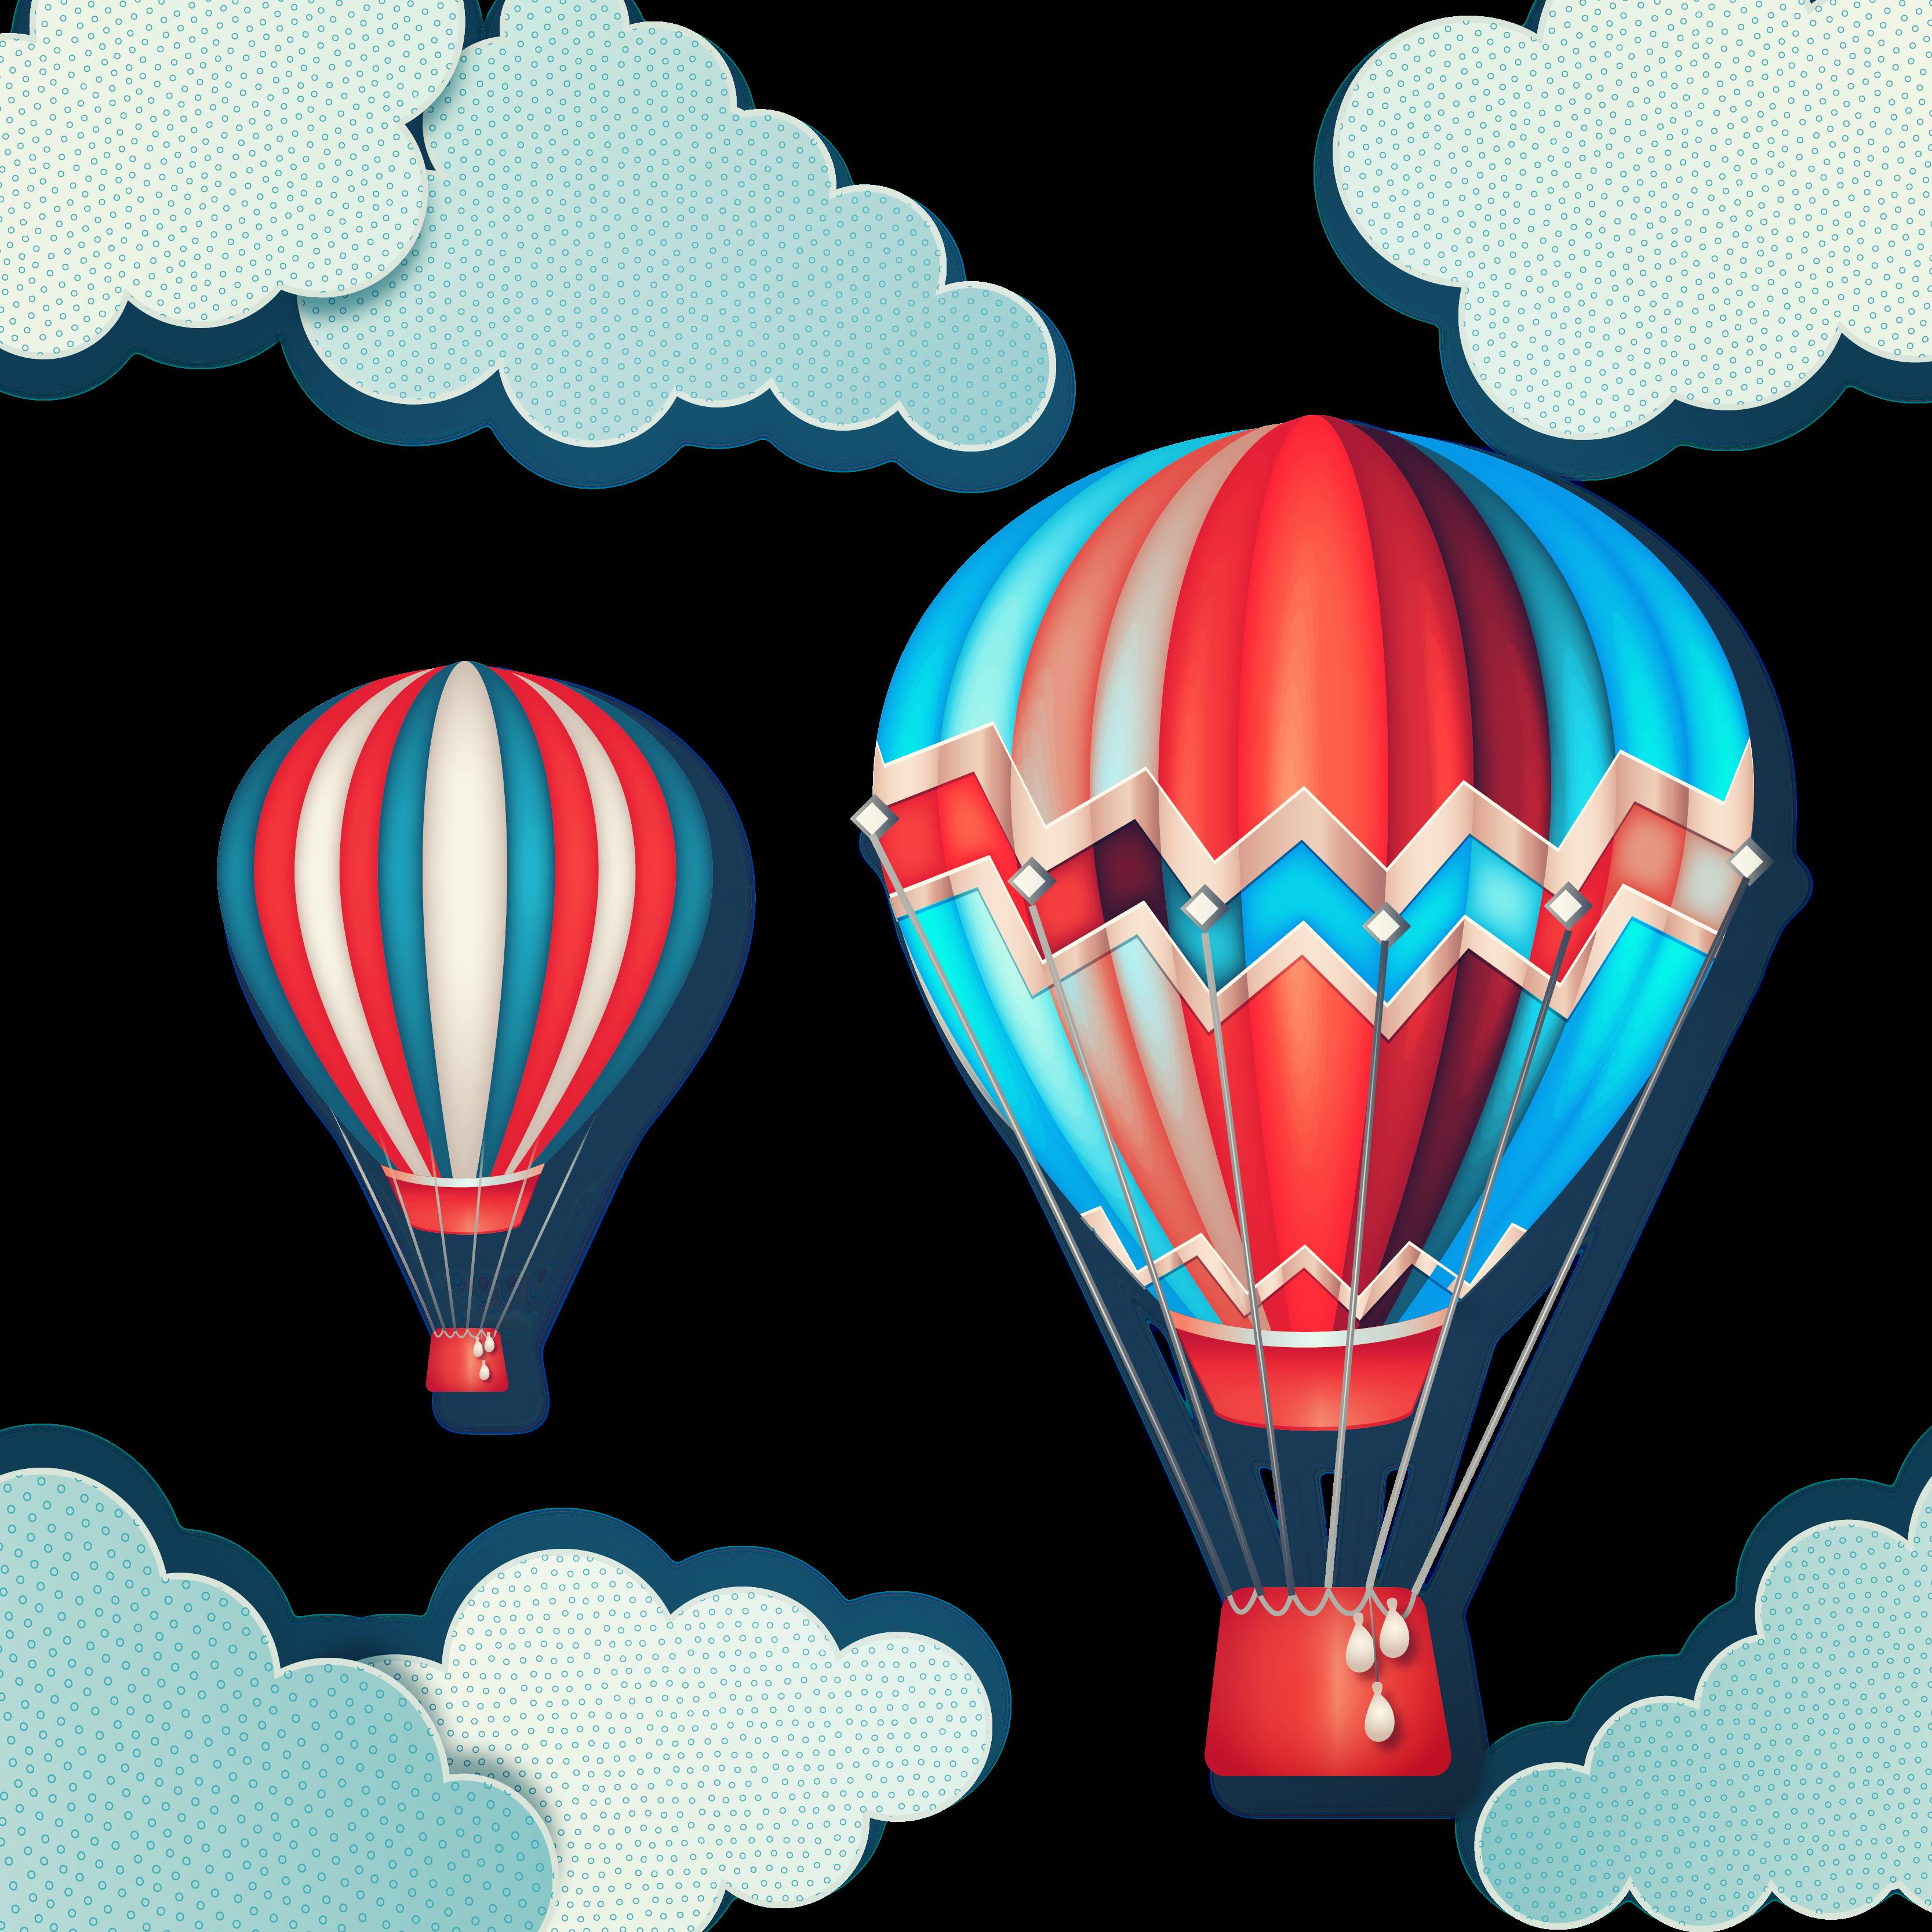 3333x3333 Toy Balloon Hot Air Balloon